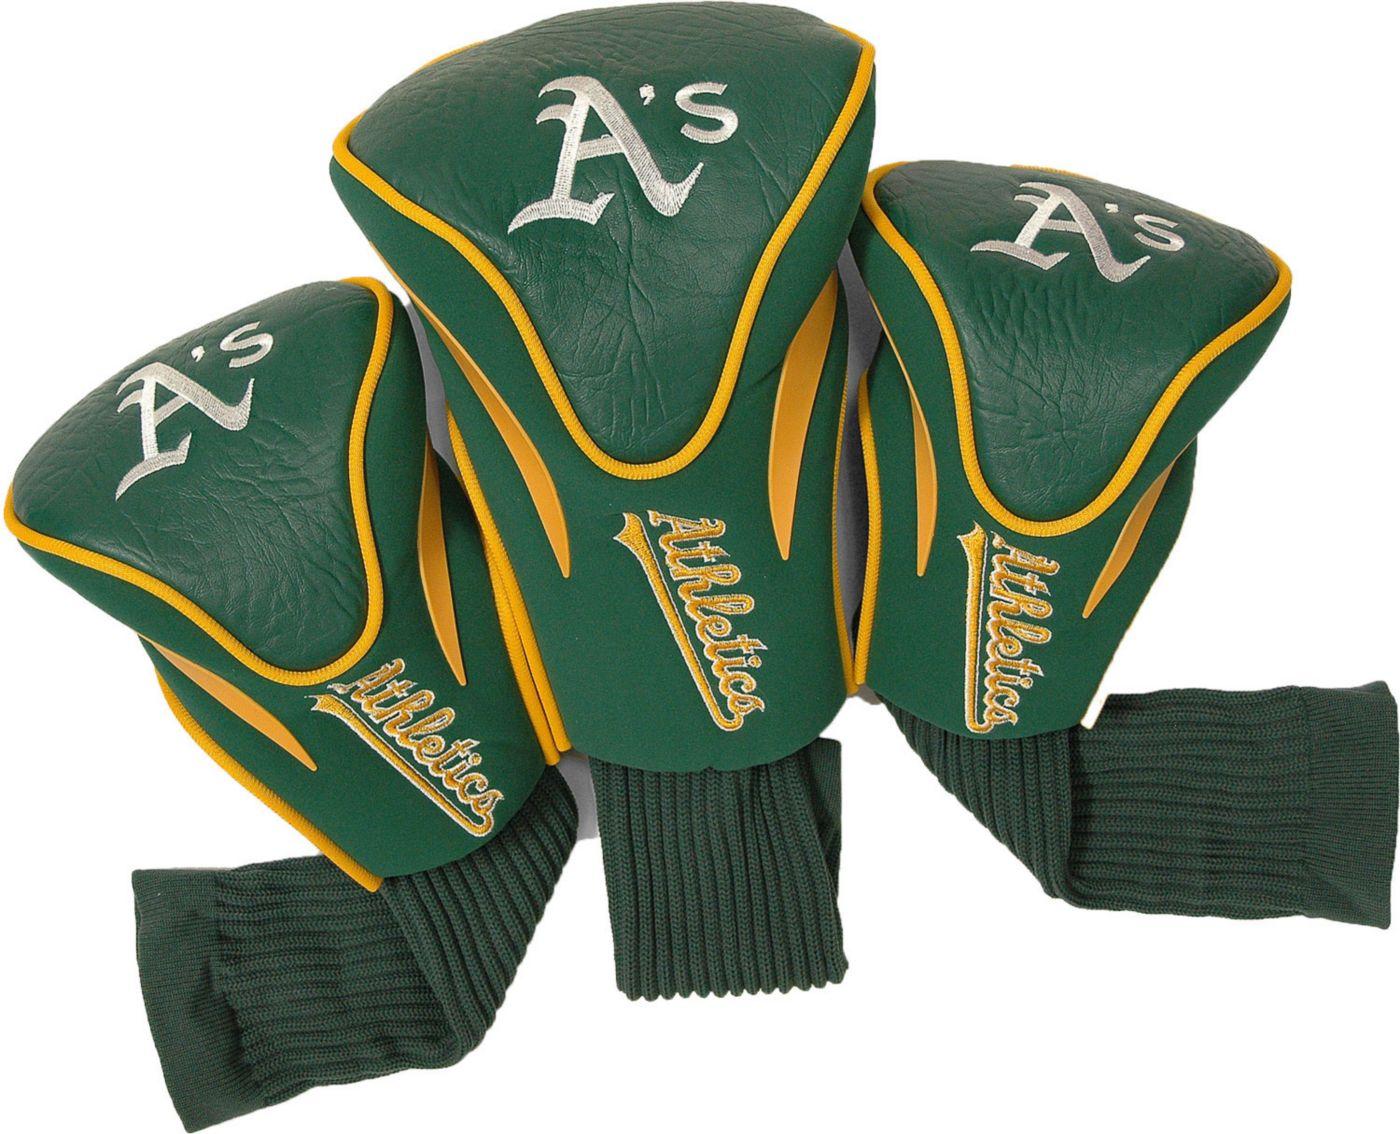 Team Golf Oakland Athletics Contour Sock Headcovers - 3 Pack